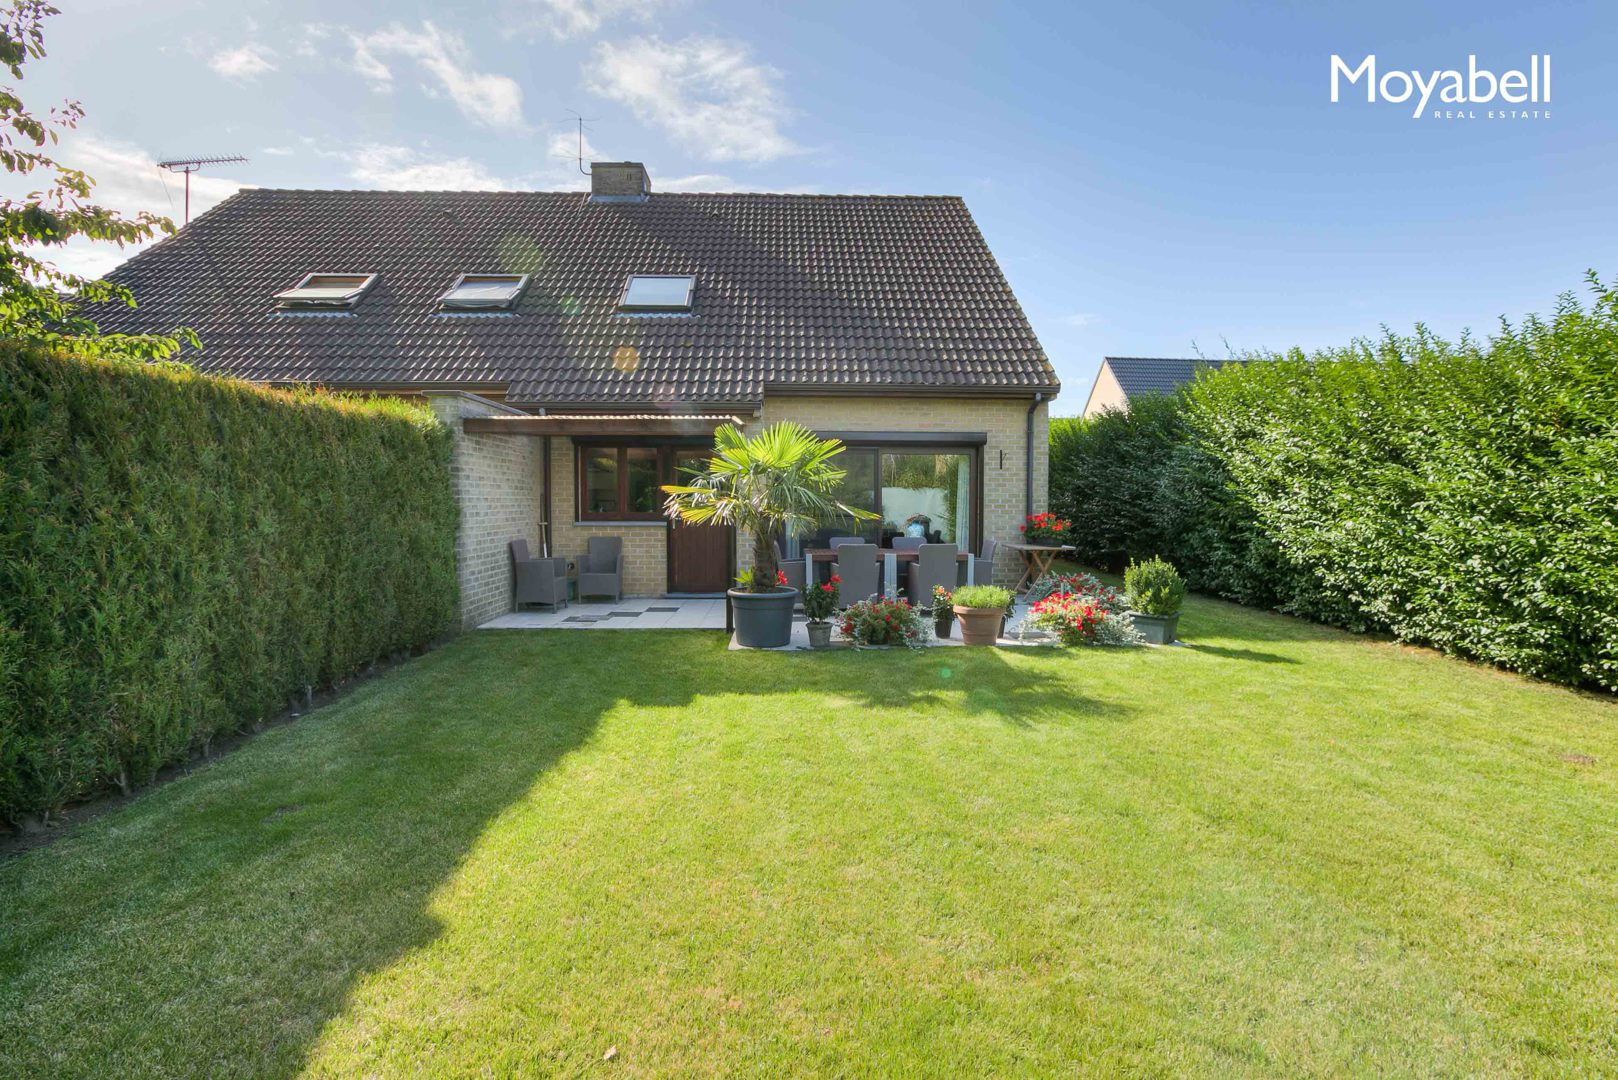 Rustig gelegen moderne woning met tuin en garage